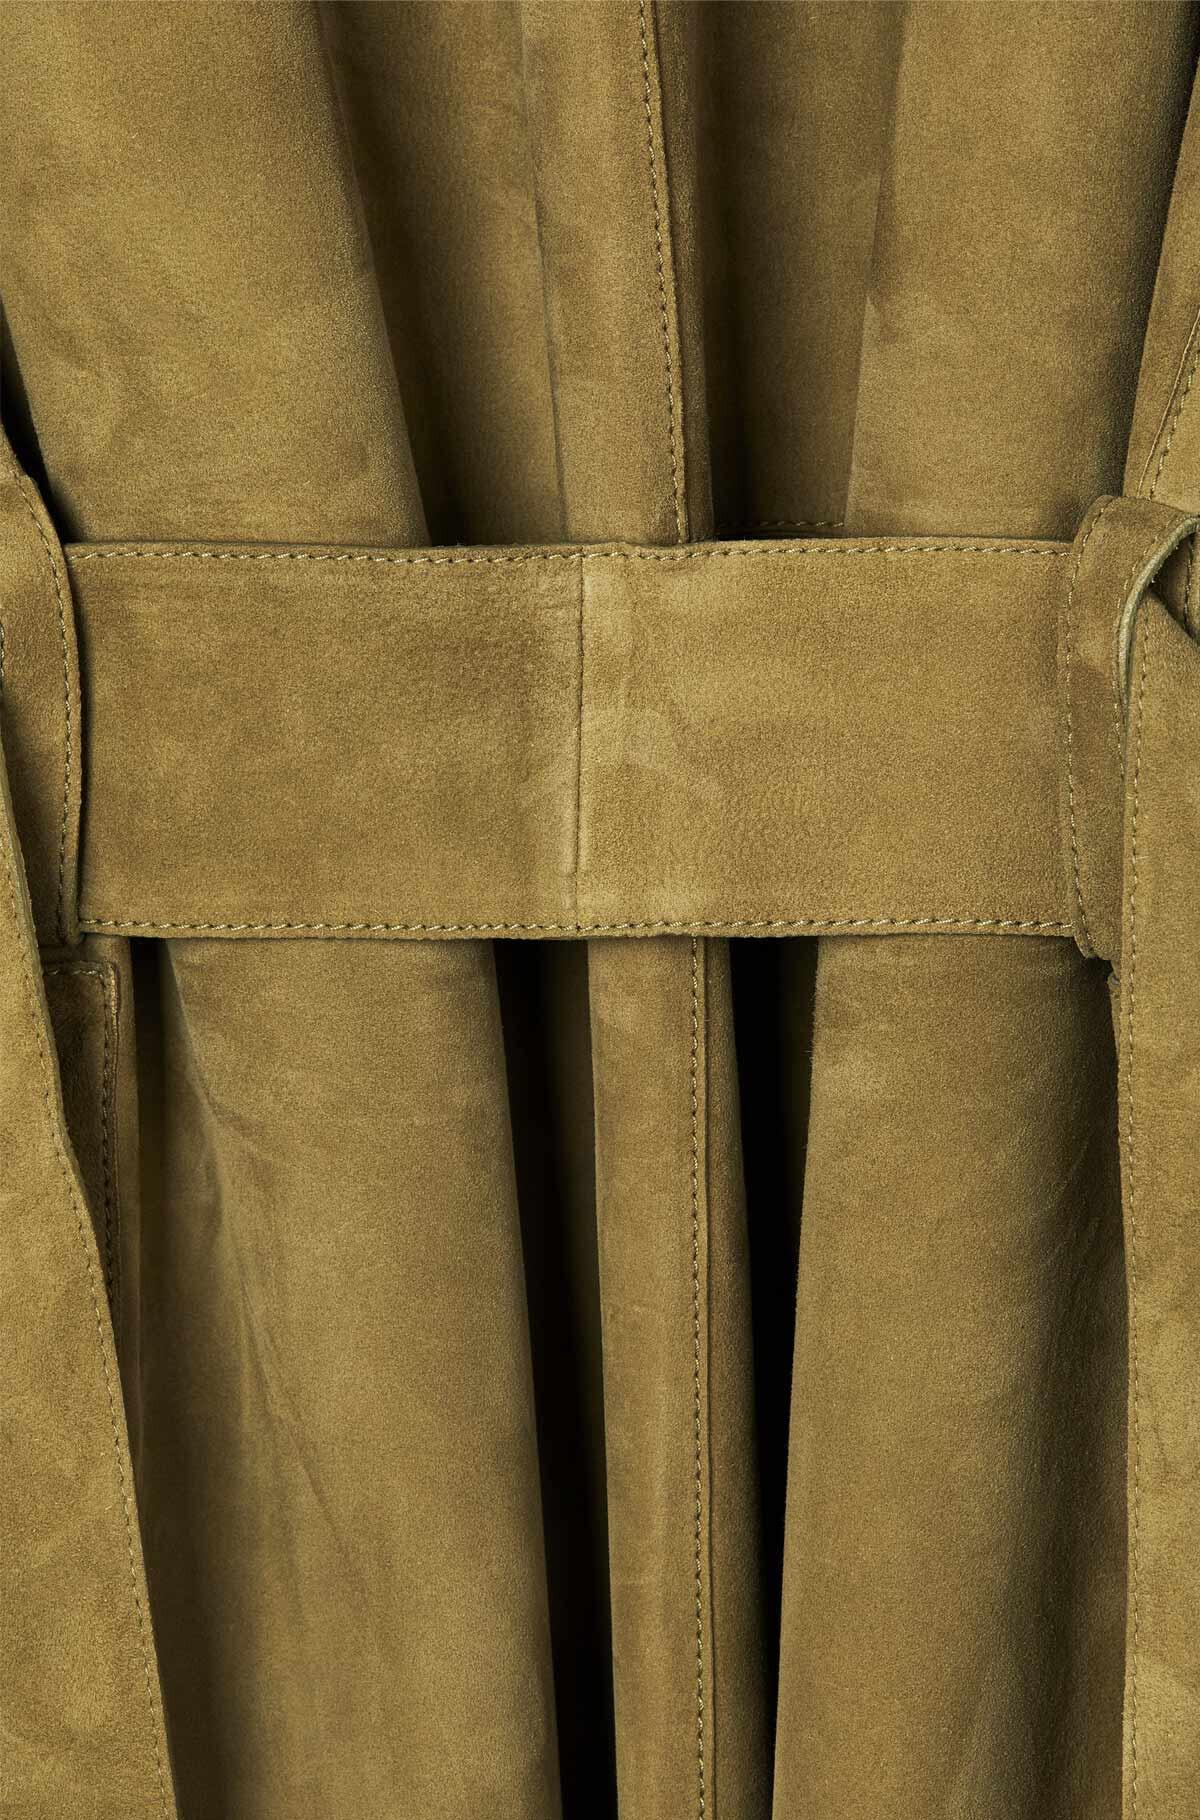 LOEWE Abrigo Verde Kaki front